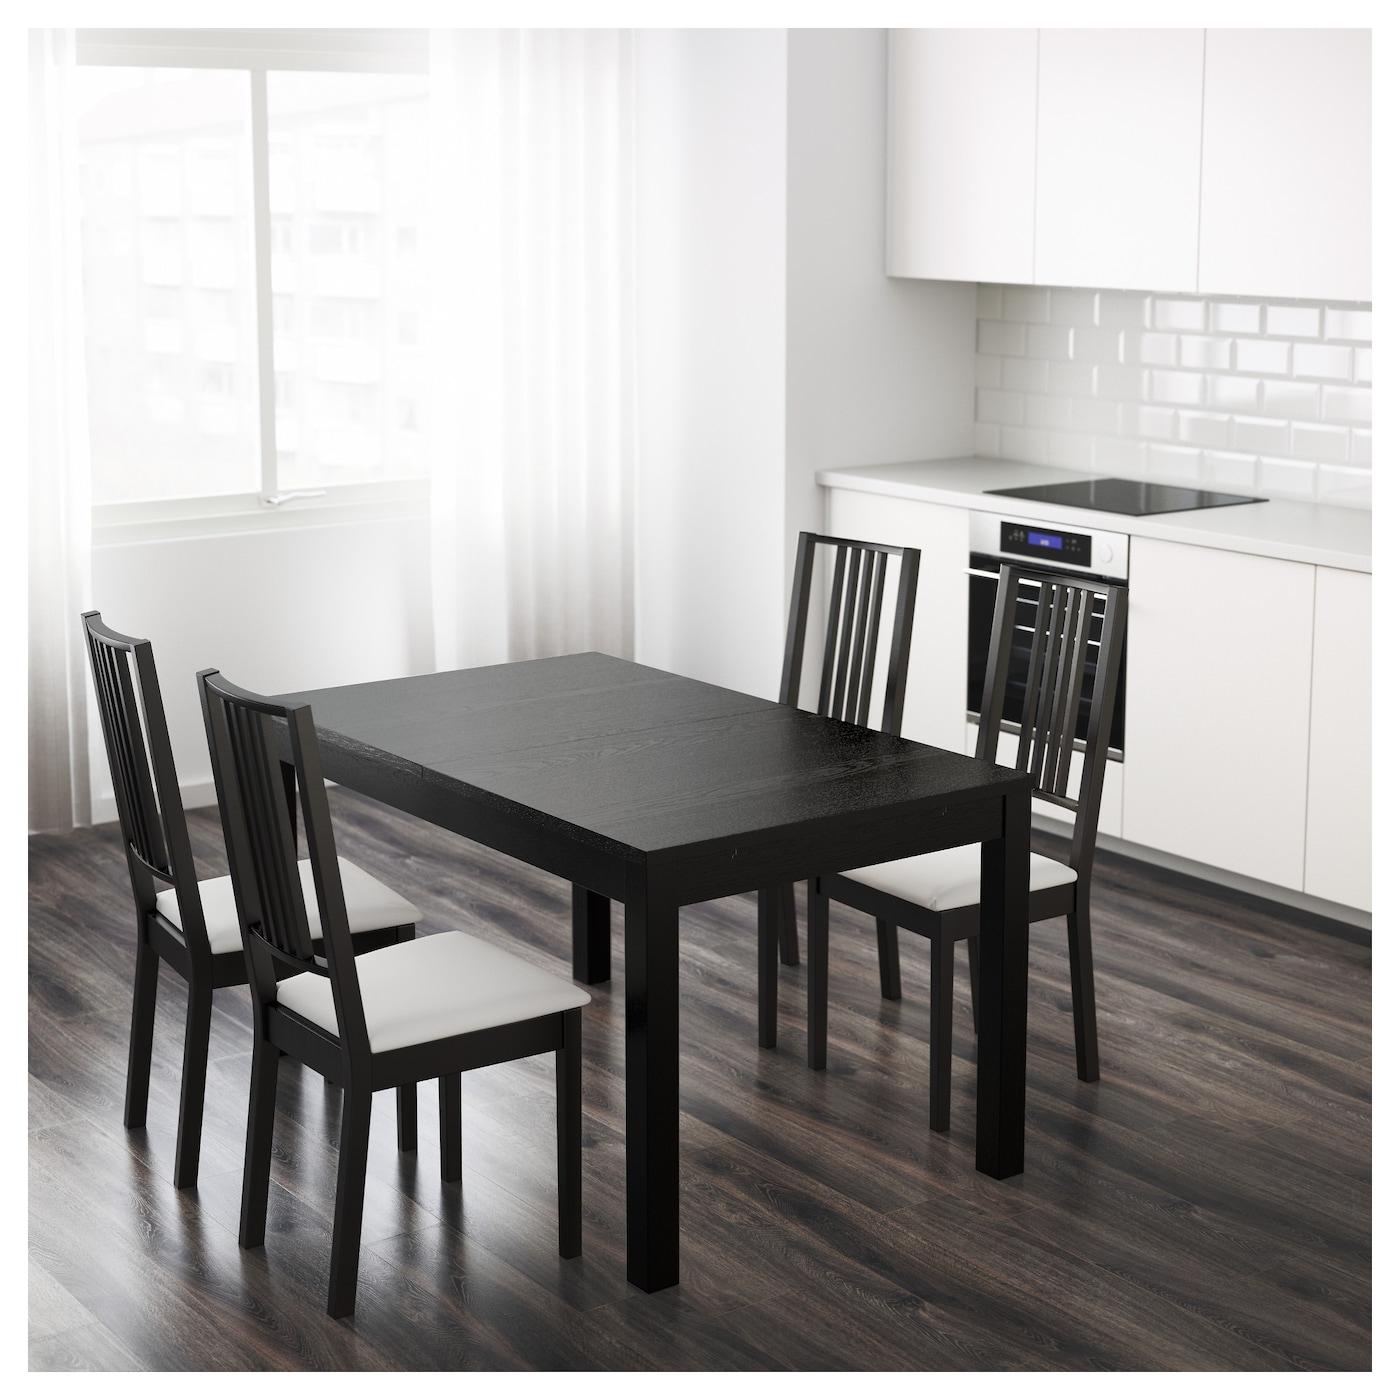 BJURSTA Mesa extensible Negro-marrón 140/180/220 x 84 cm - IKEA